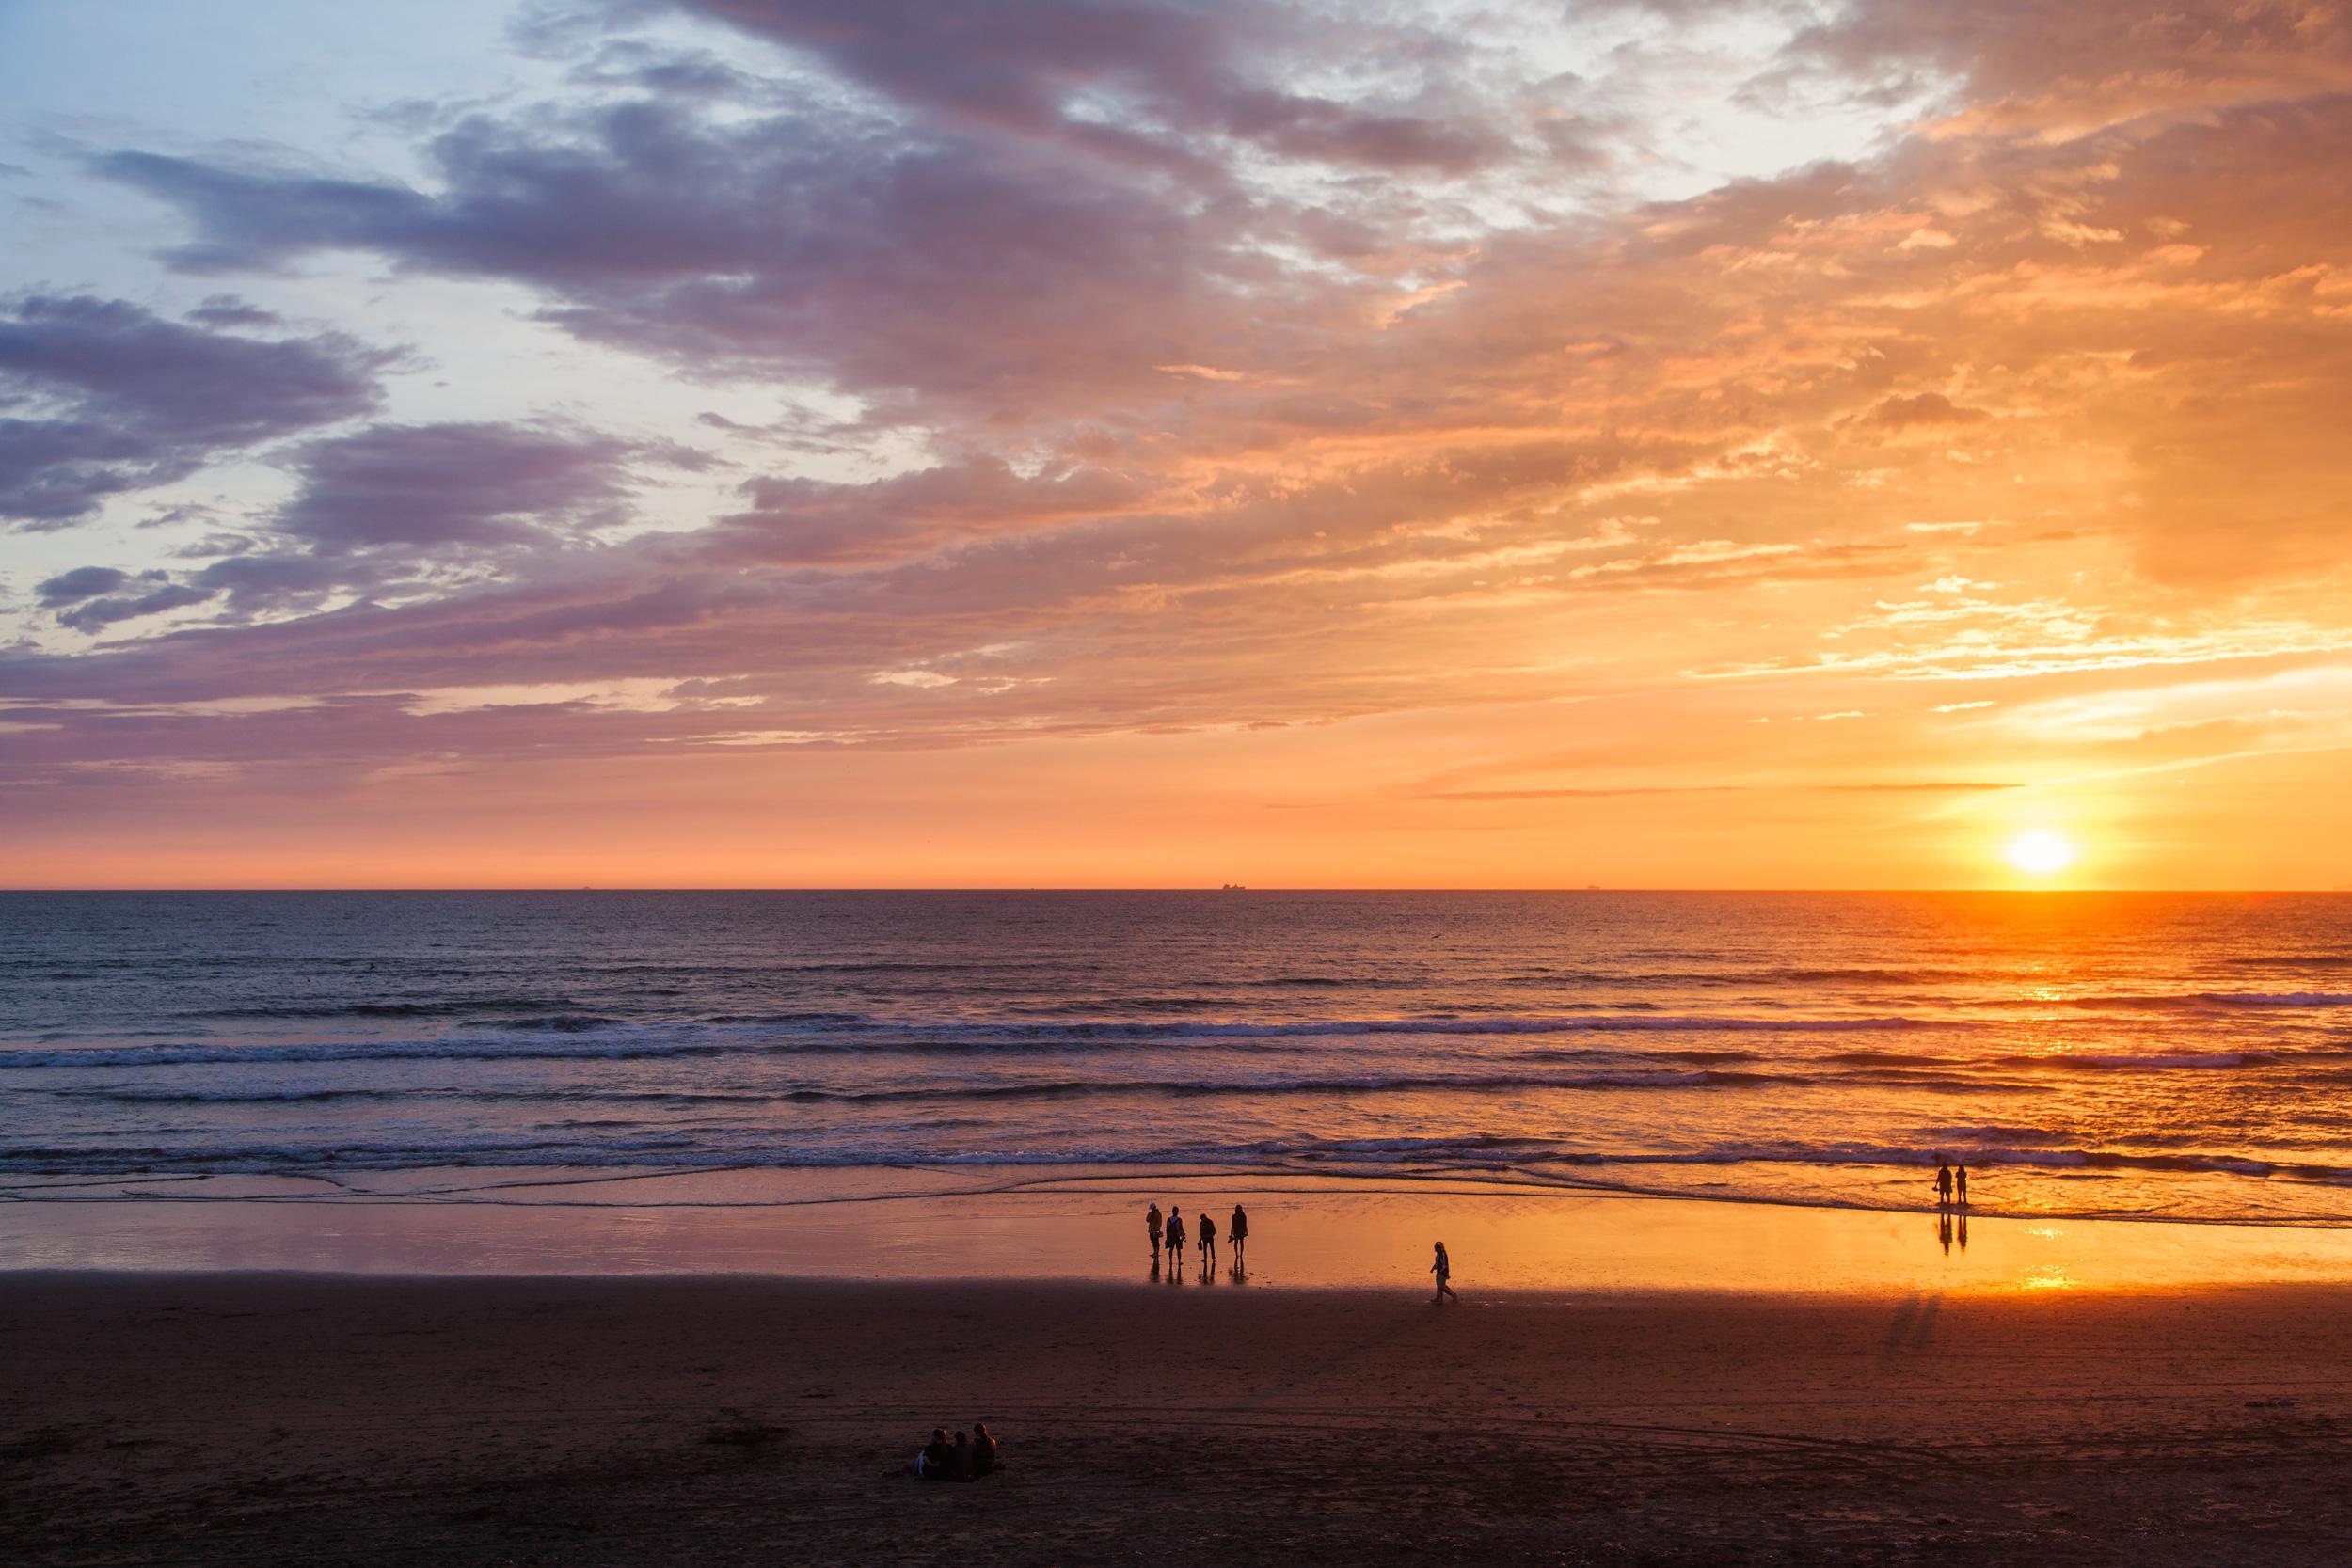 20150719_0517 ocean beach sunset sf photography.jpg